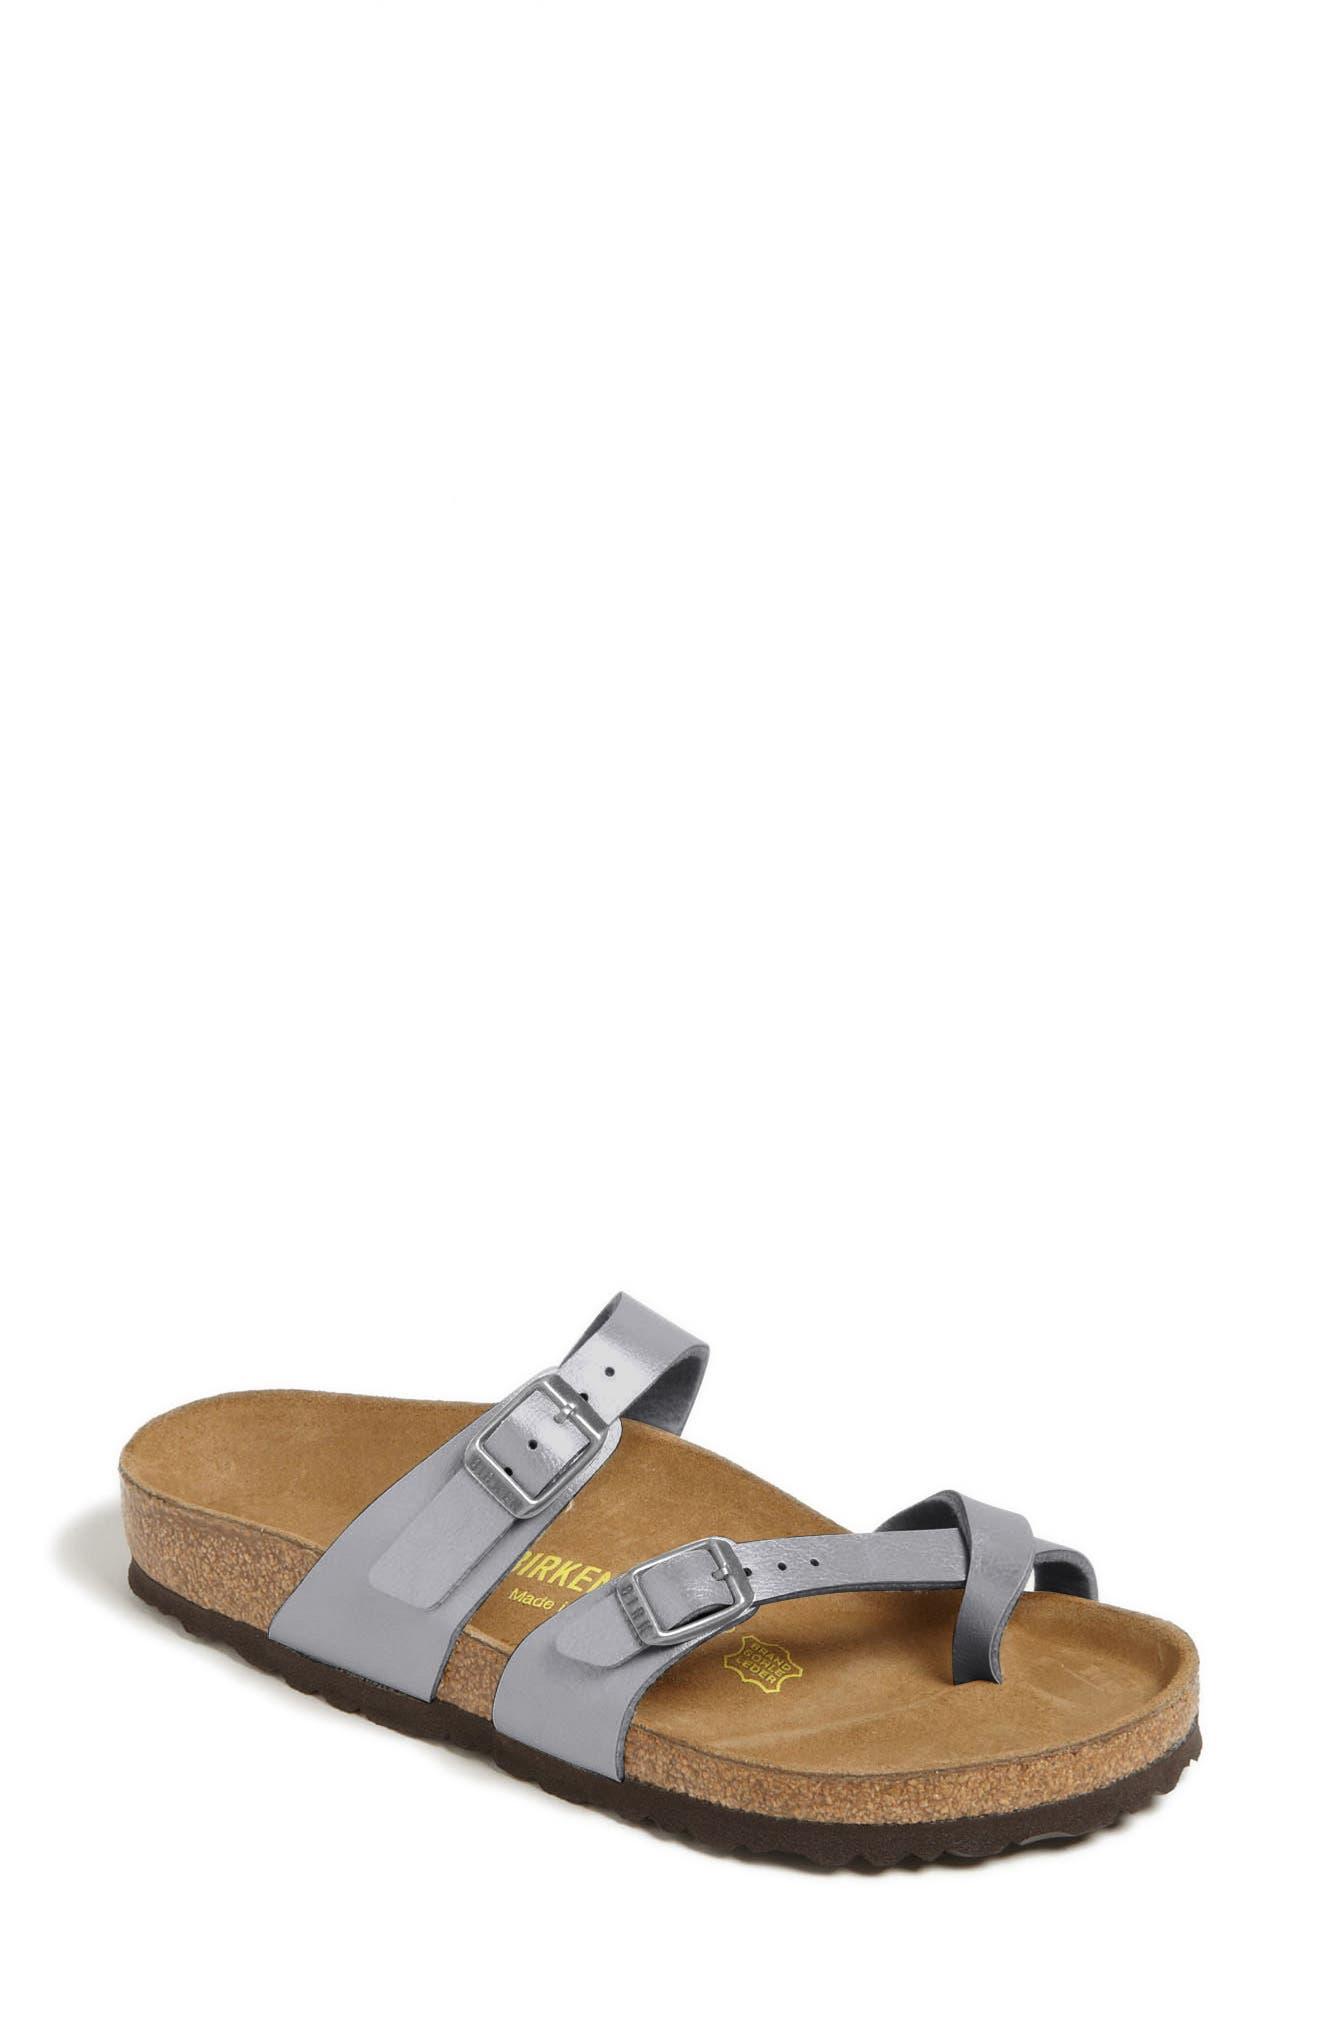 BITTER & SWEET Women's Comfort Sandals Black in Size 38 IMiNFG0